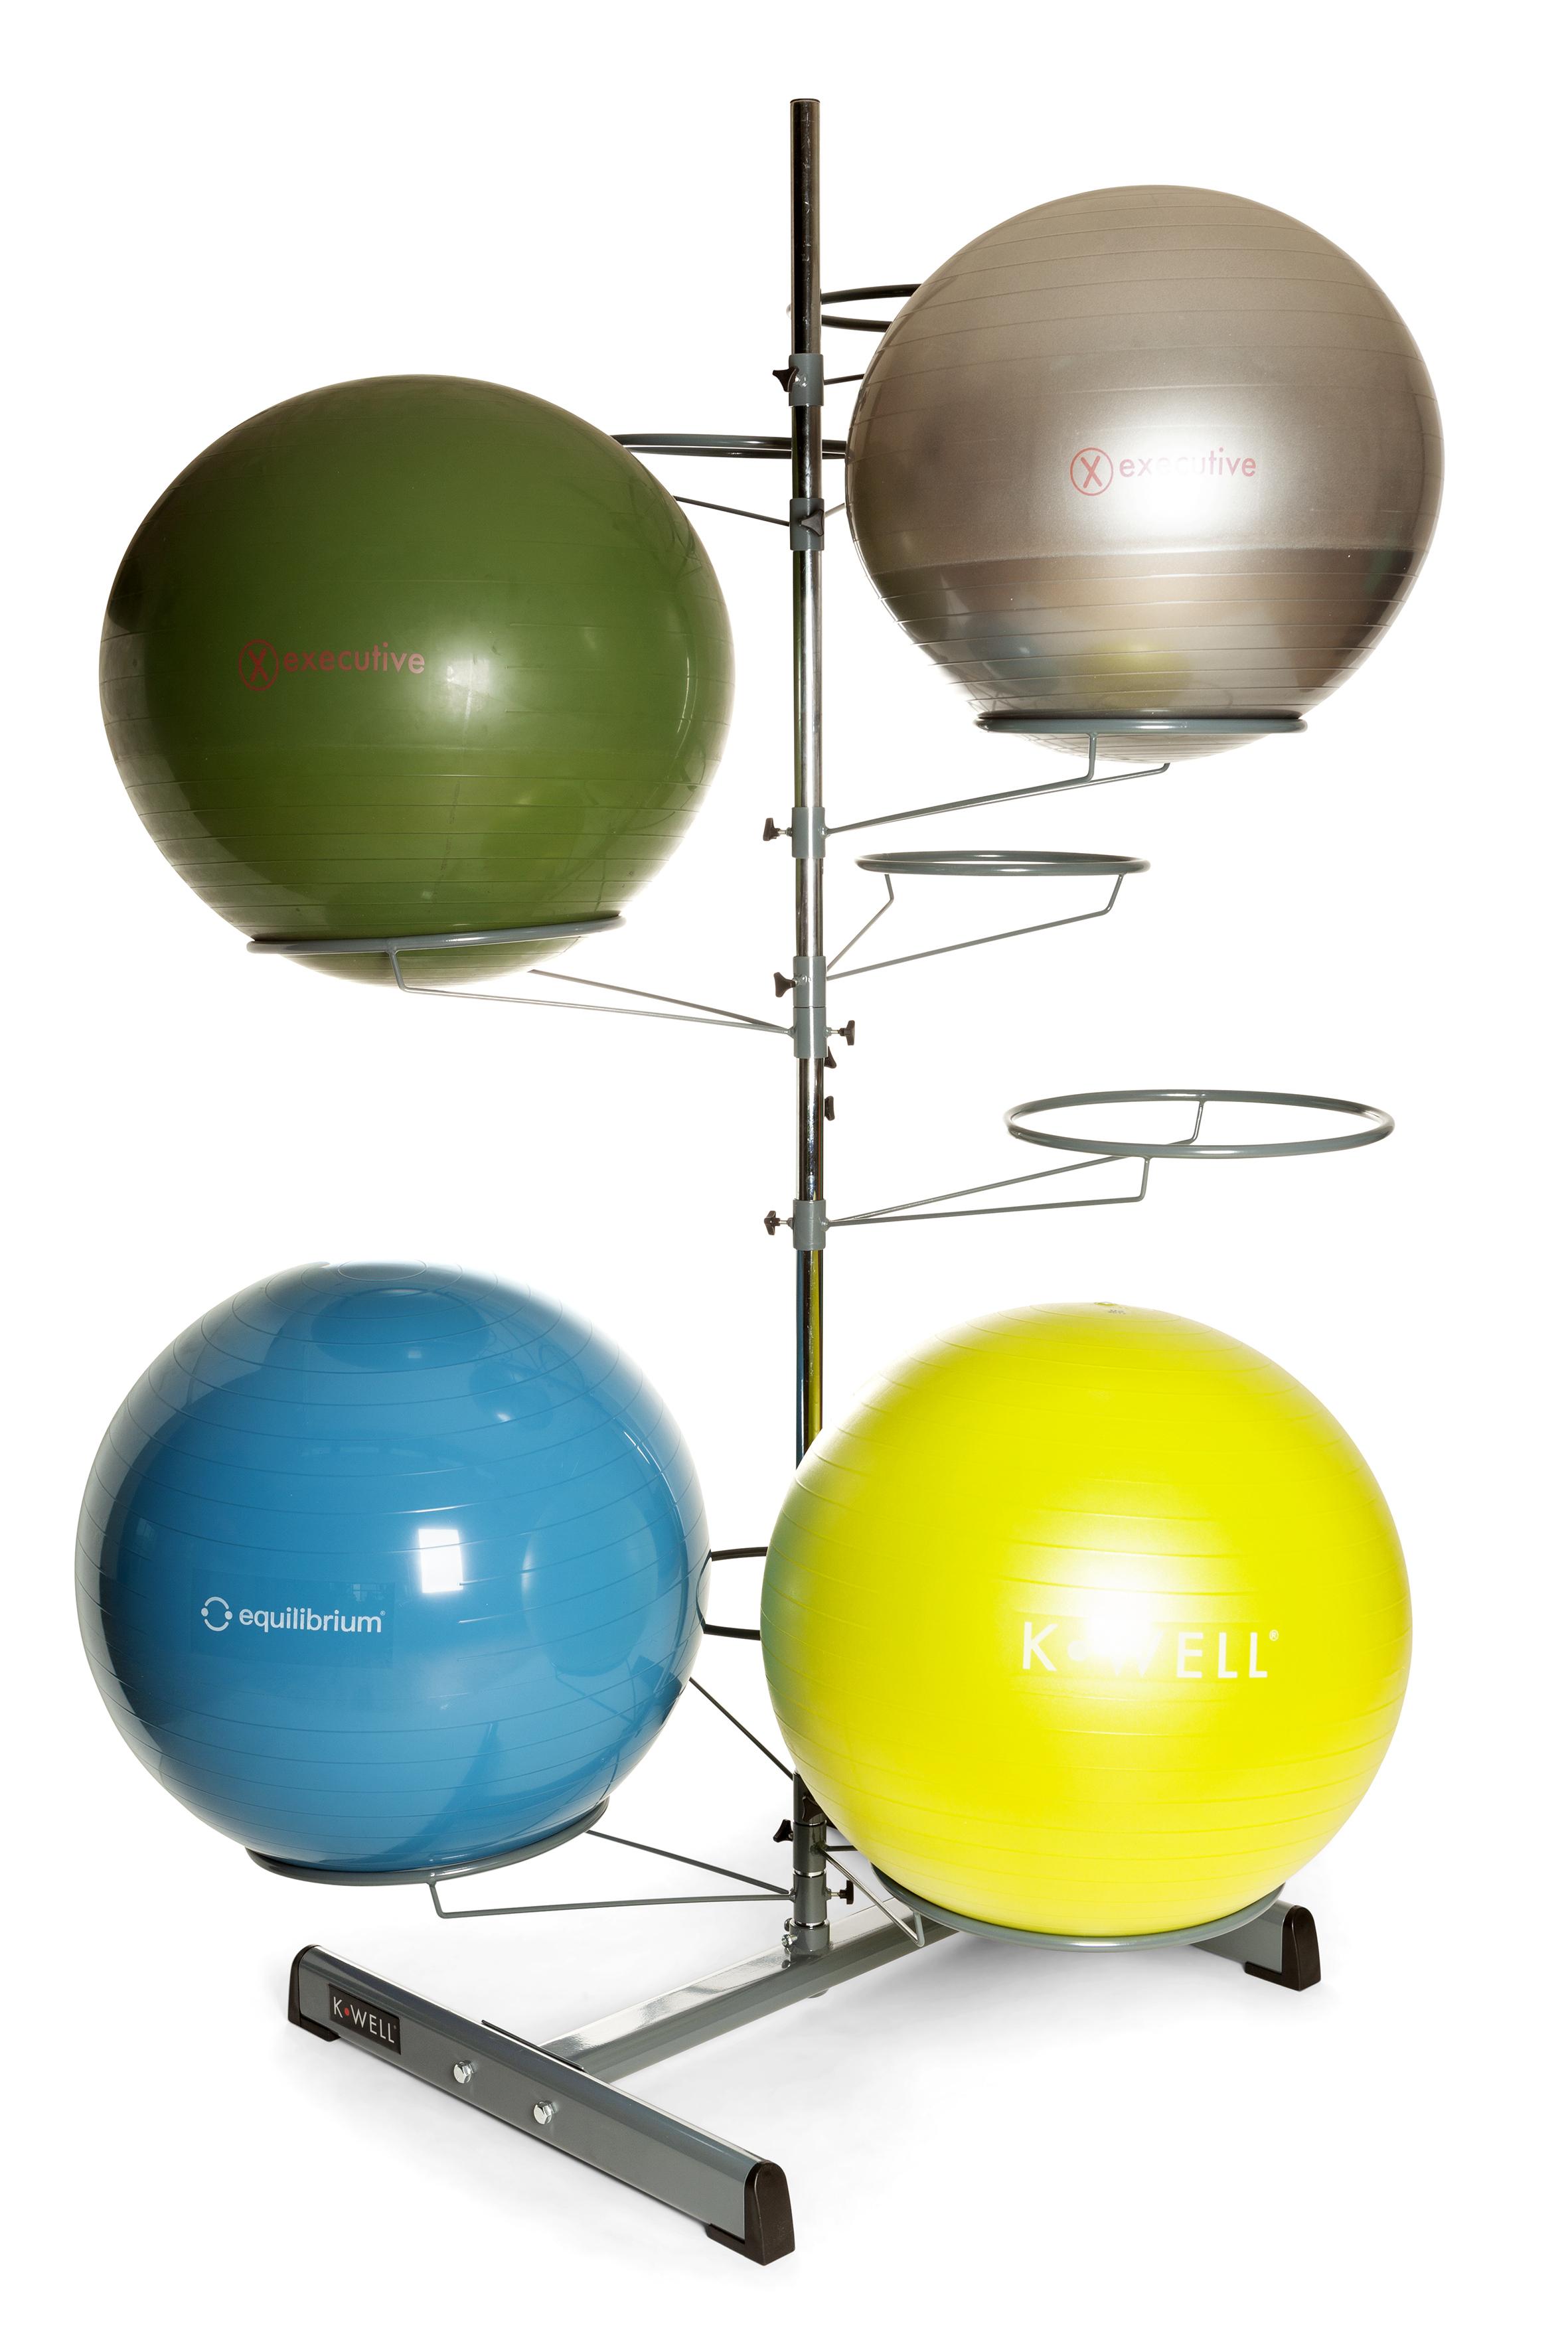 Kwell arbre / rangement - 10 ballons d'exercice/siège